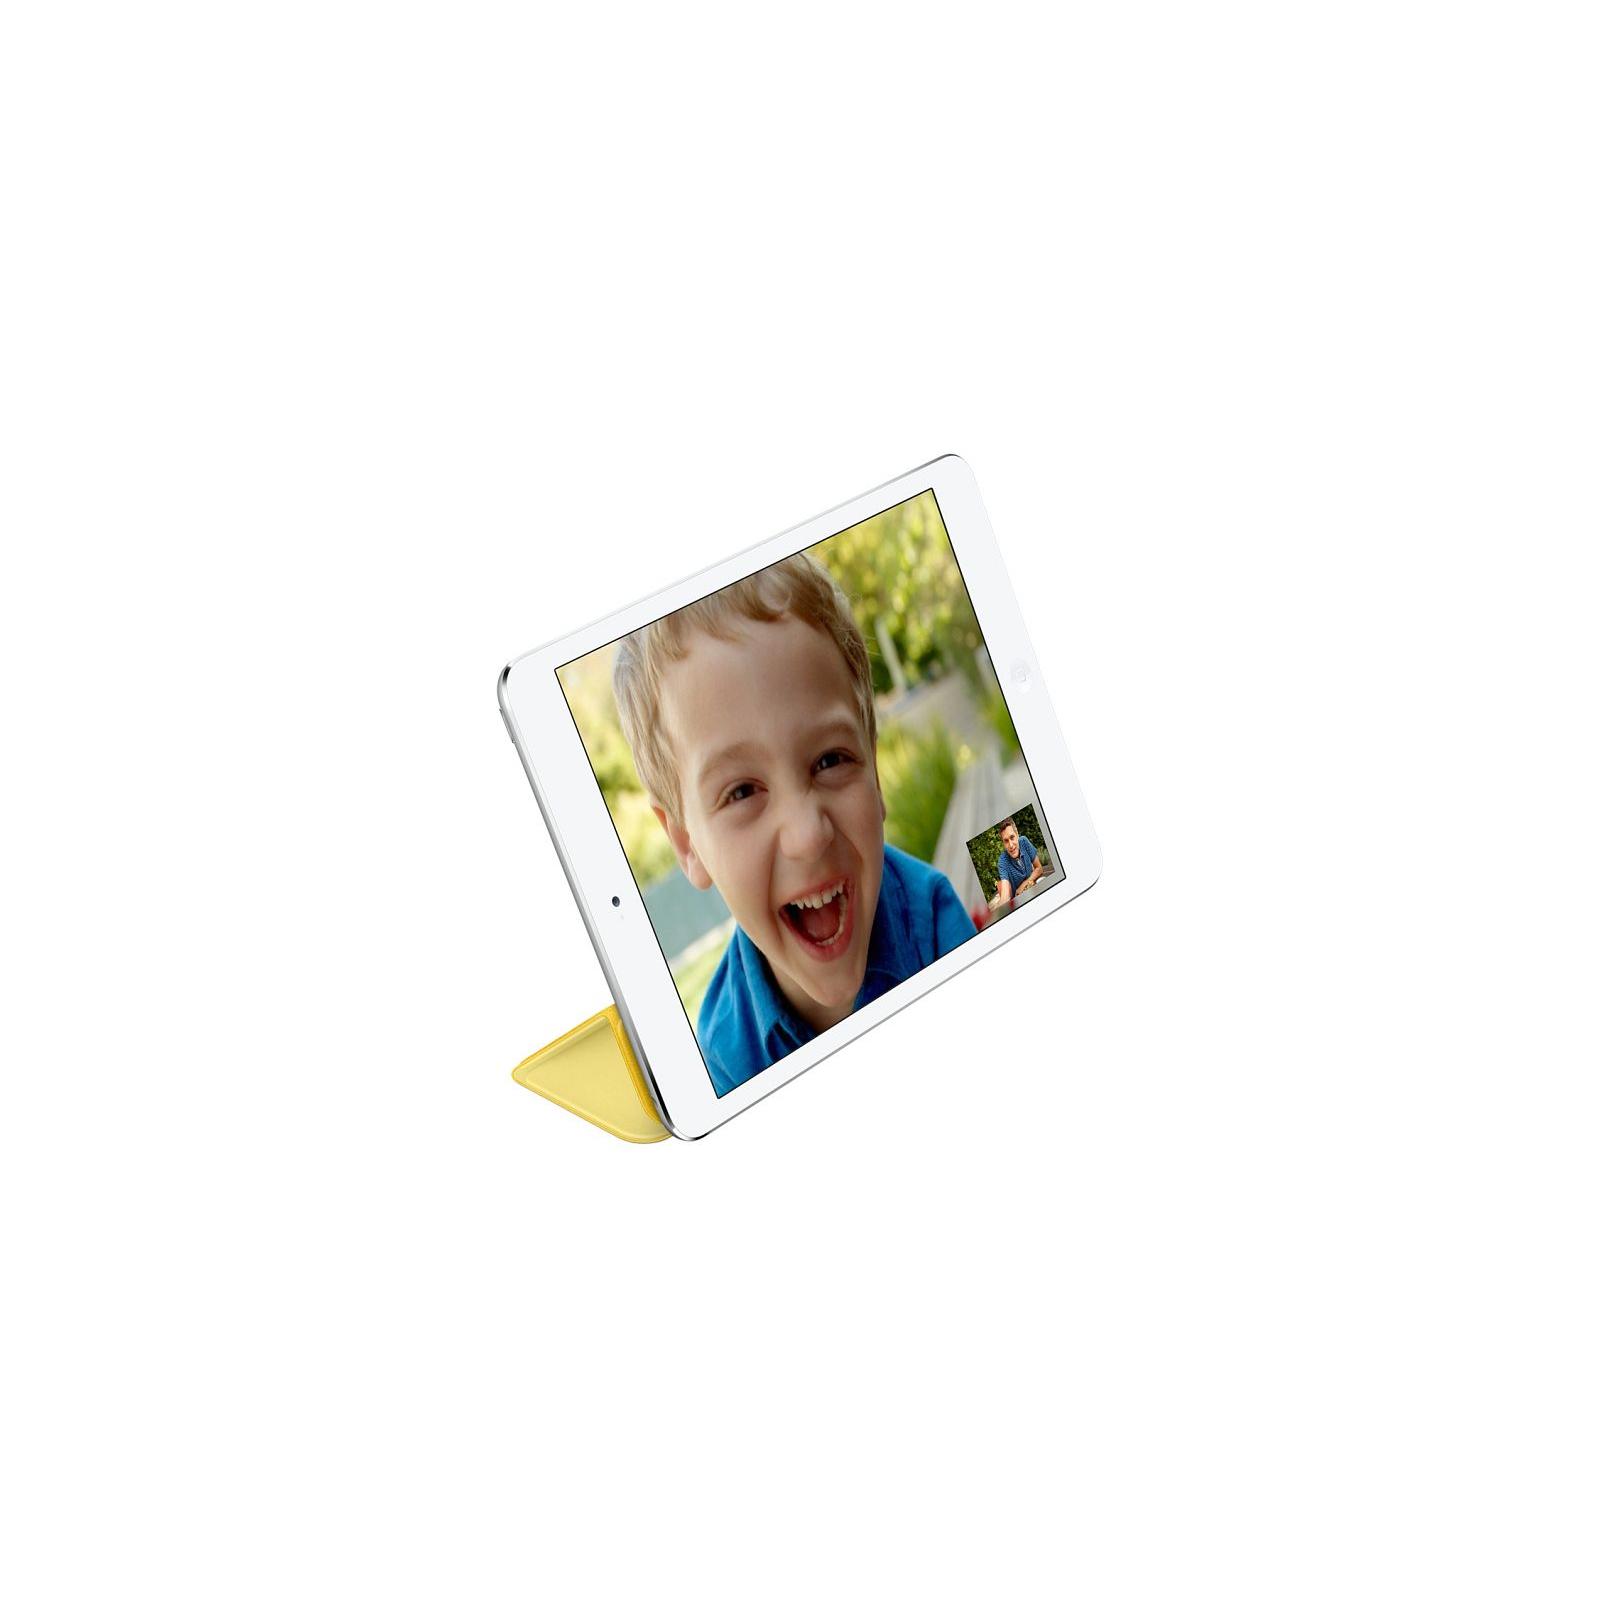 Чехол для планшета Apple Smart Cover для iPad mini /yellow (MF063ZM/A) изображение 5